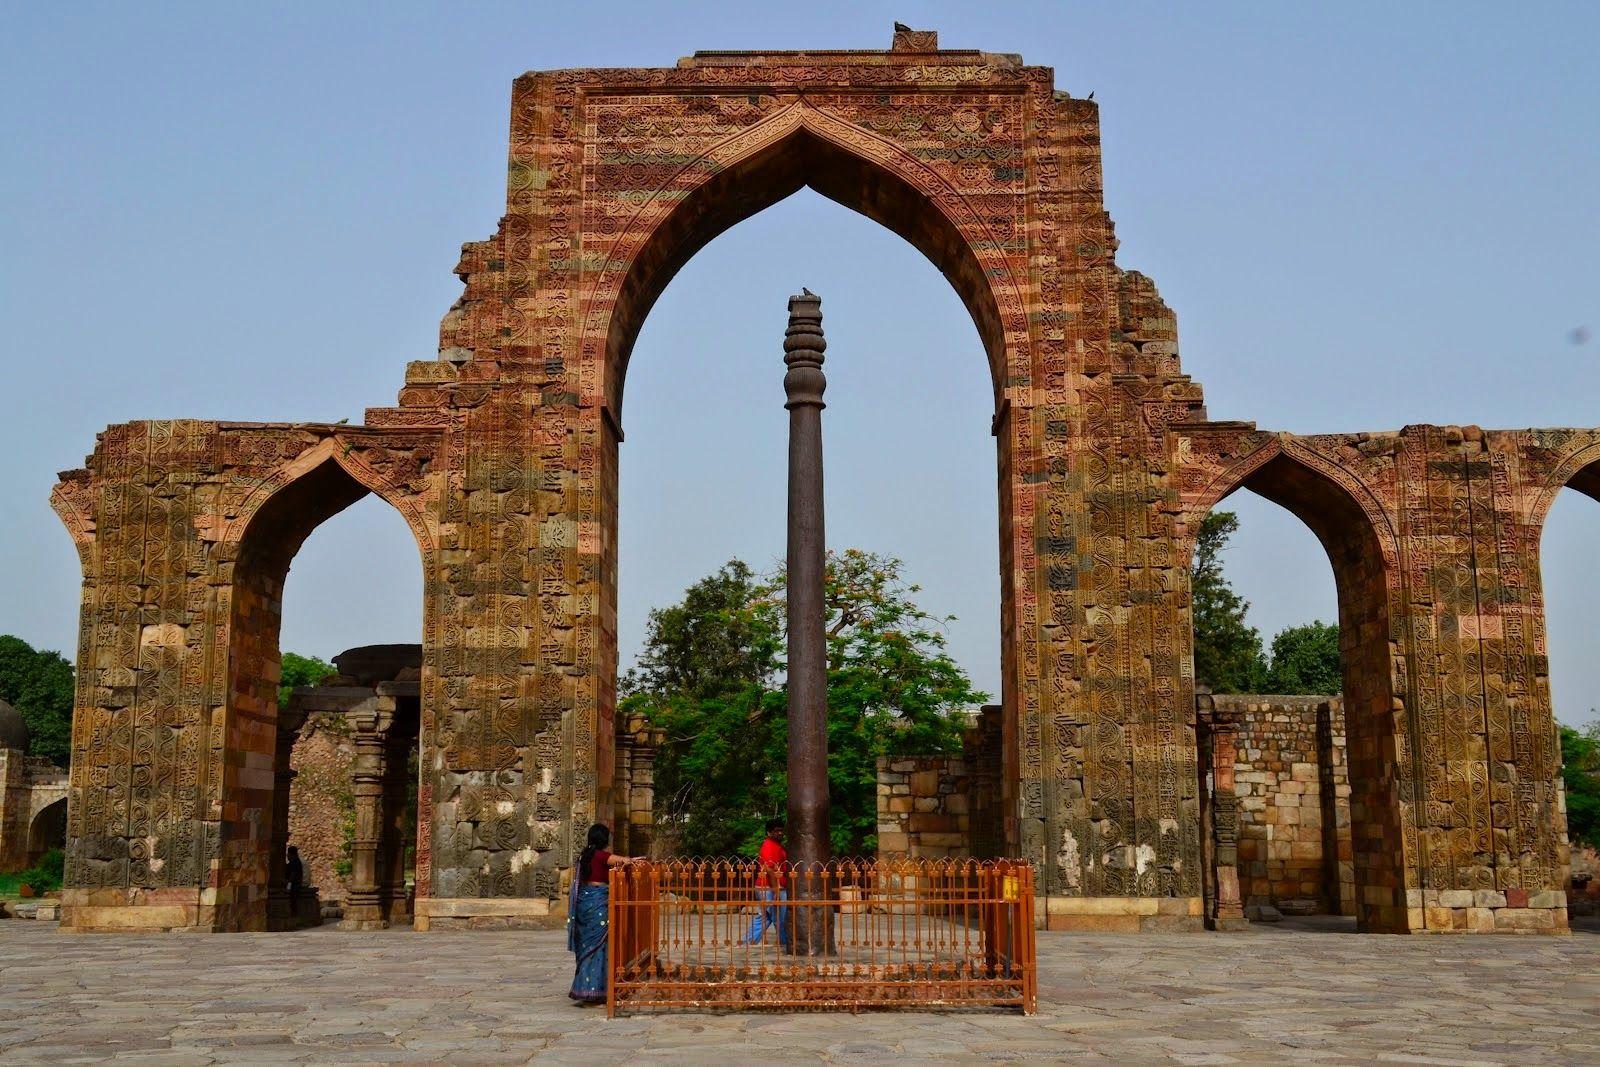 Mystery of 1600 years old Iron Pillar of Delhi ~ Mysteries of india Mar 19,  2011 - The Iron Pillar dates back even furth…   Iron pillar of delhi, New  delhi, Pillars